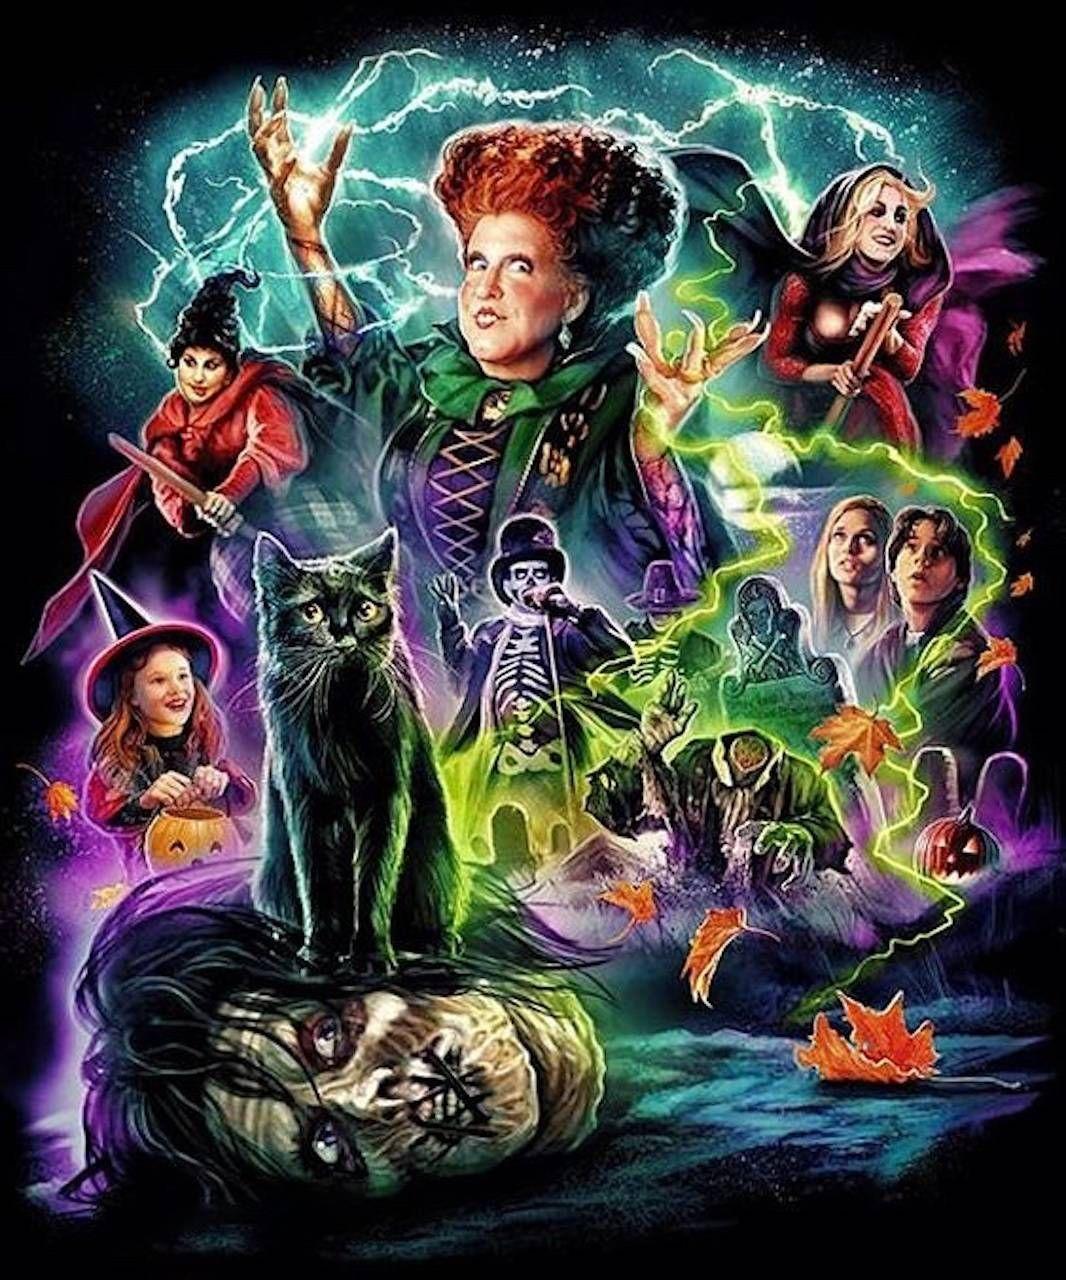 Download Hocus Pocus Wallpaper By Marimar94 24 Free On Zedge Now Browse Millions Of Popular Ha Halloween Pictures Halloween Hocus Pocus Hocus Pocus Movie